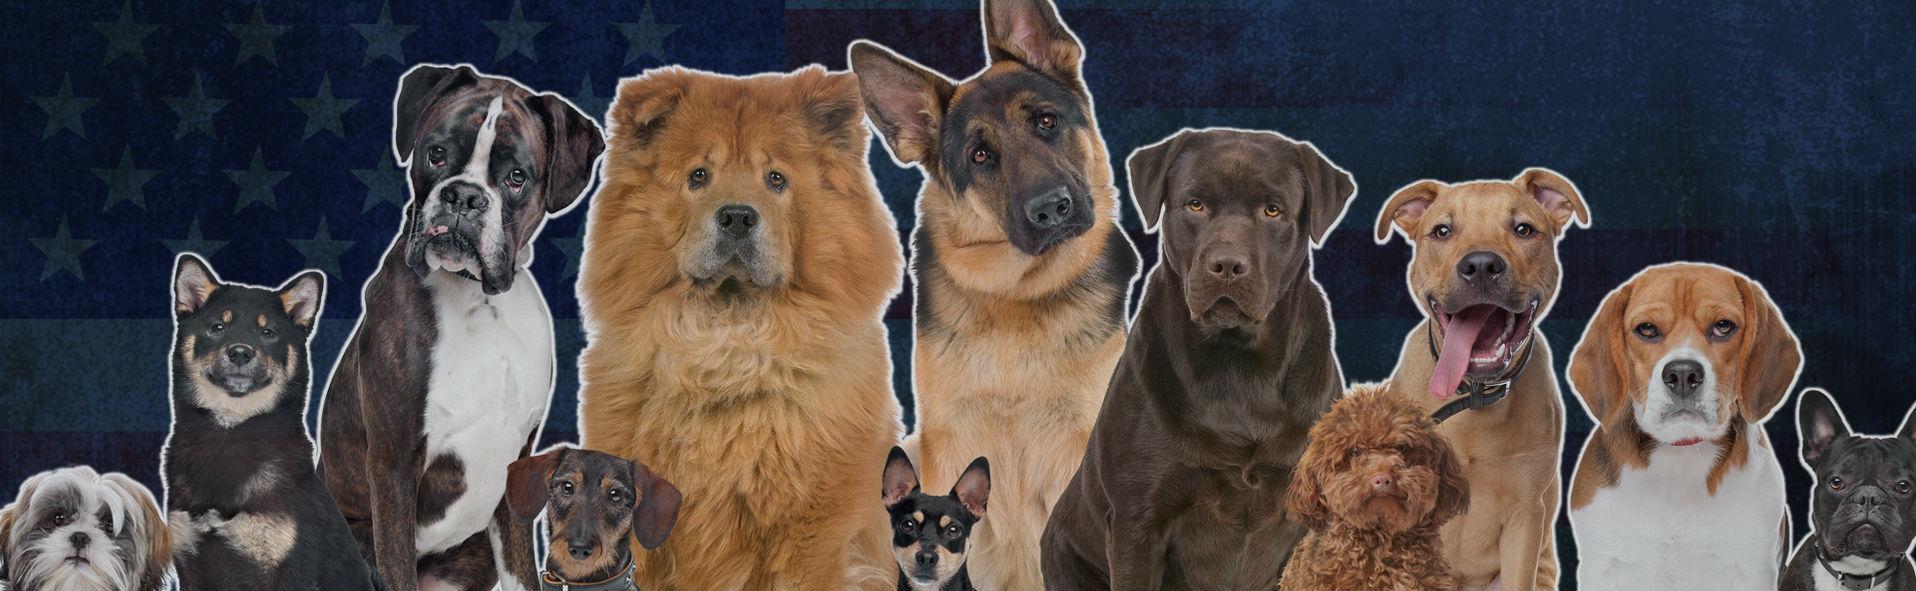 Puppy Training - Patriot Dog Training